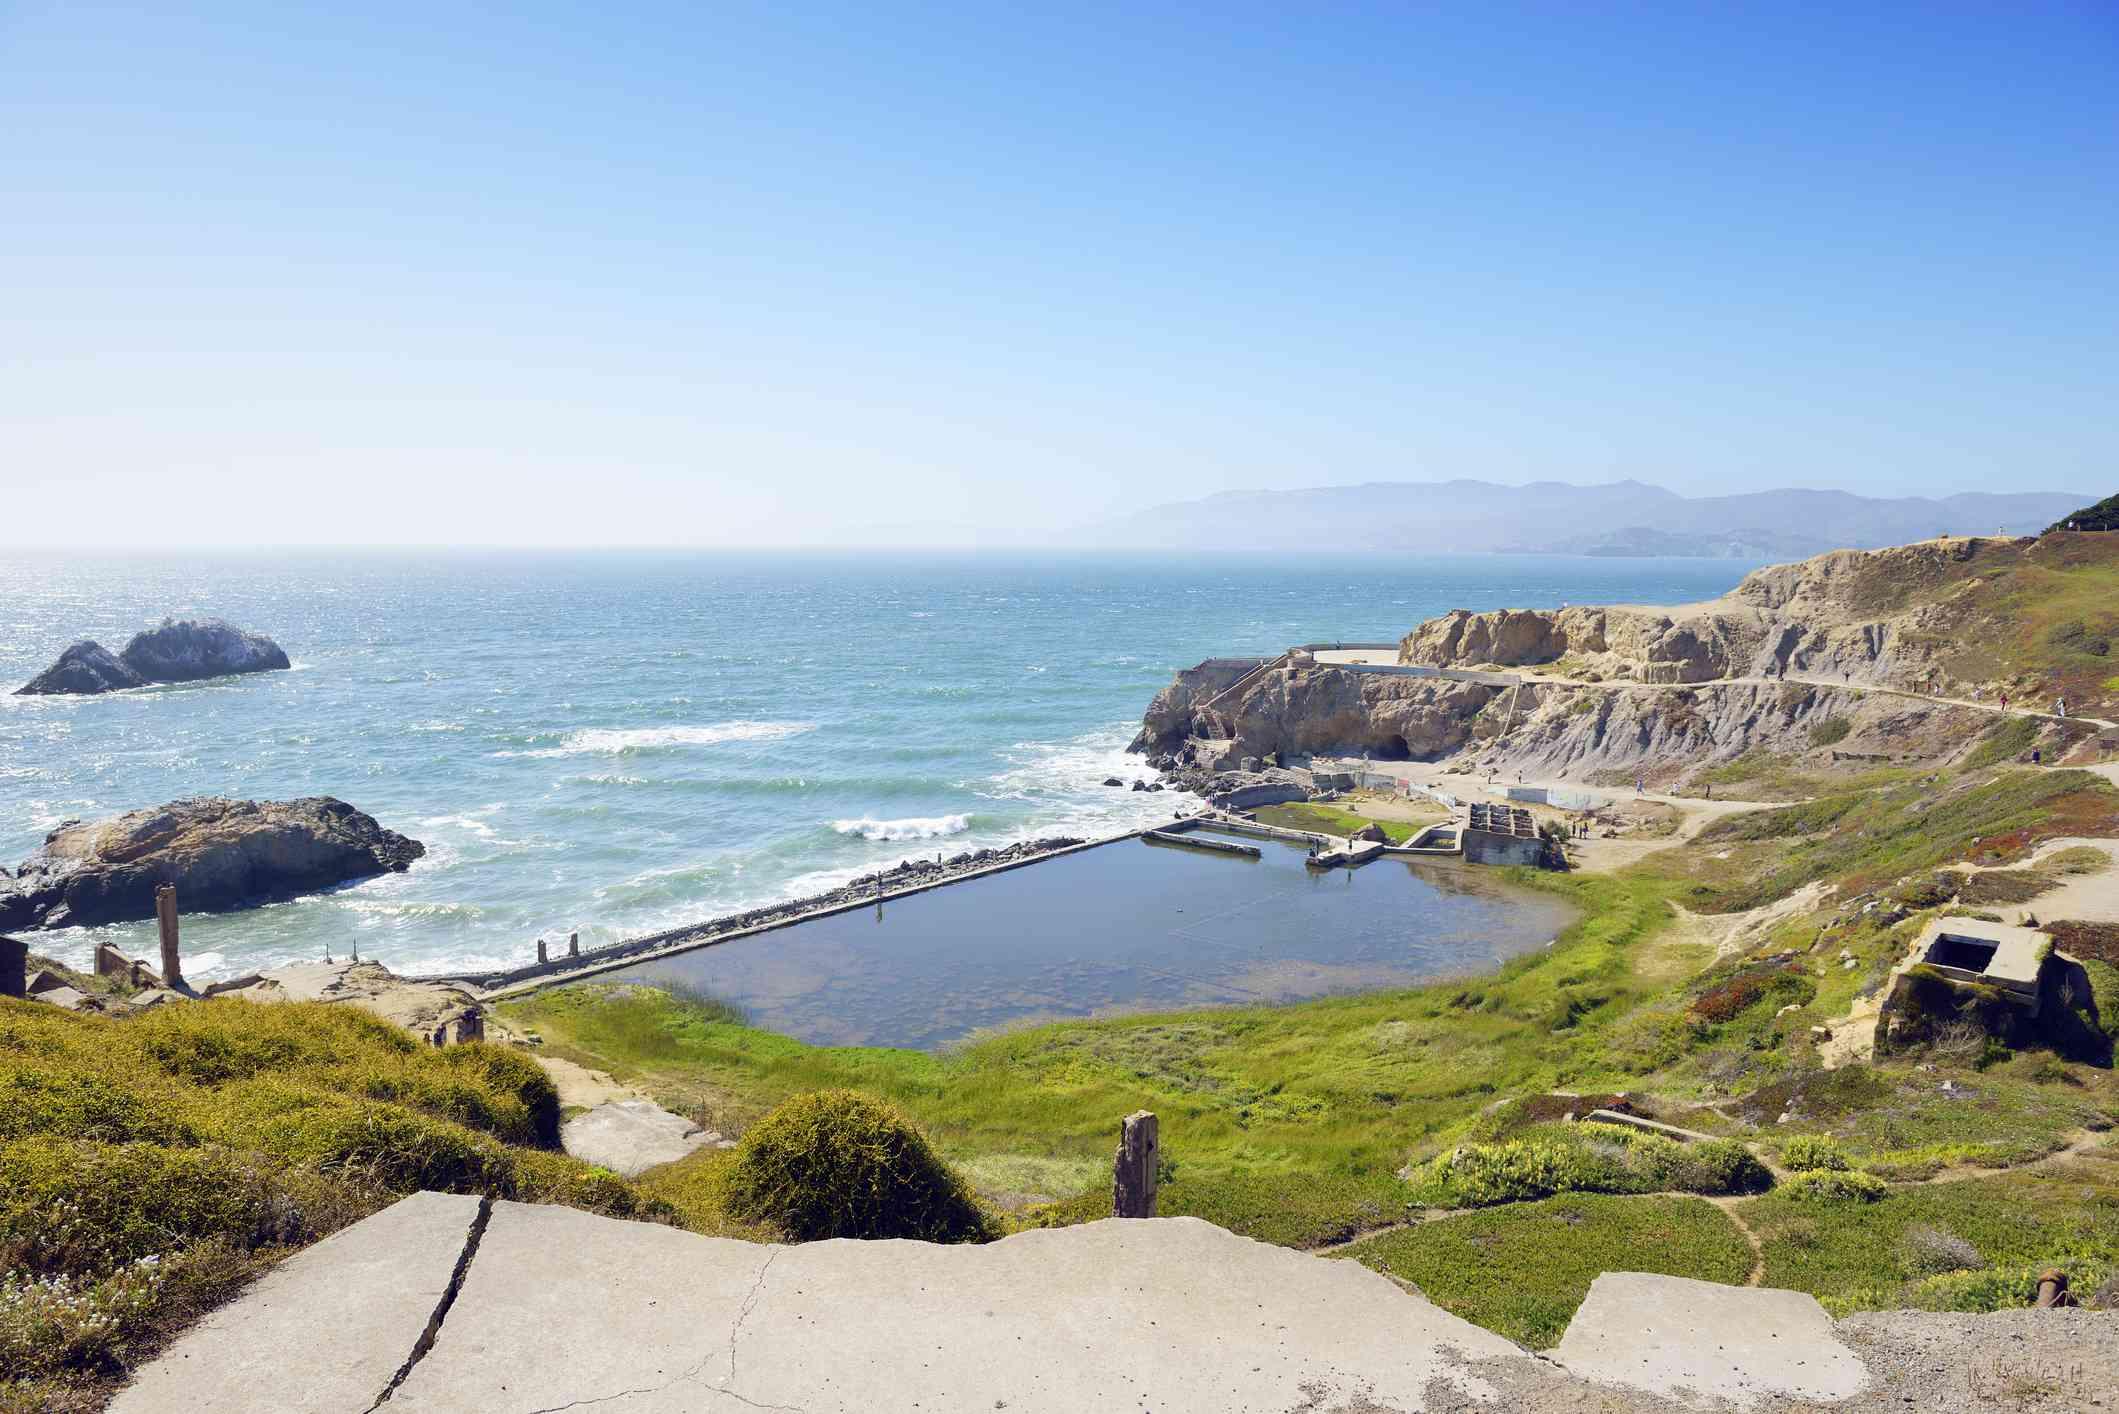 Ruins of Sutro Baths in San Francisco